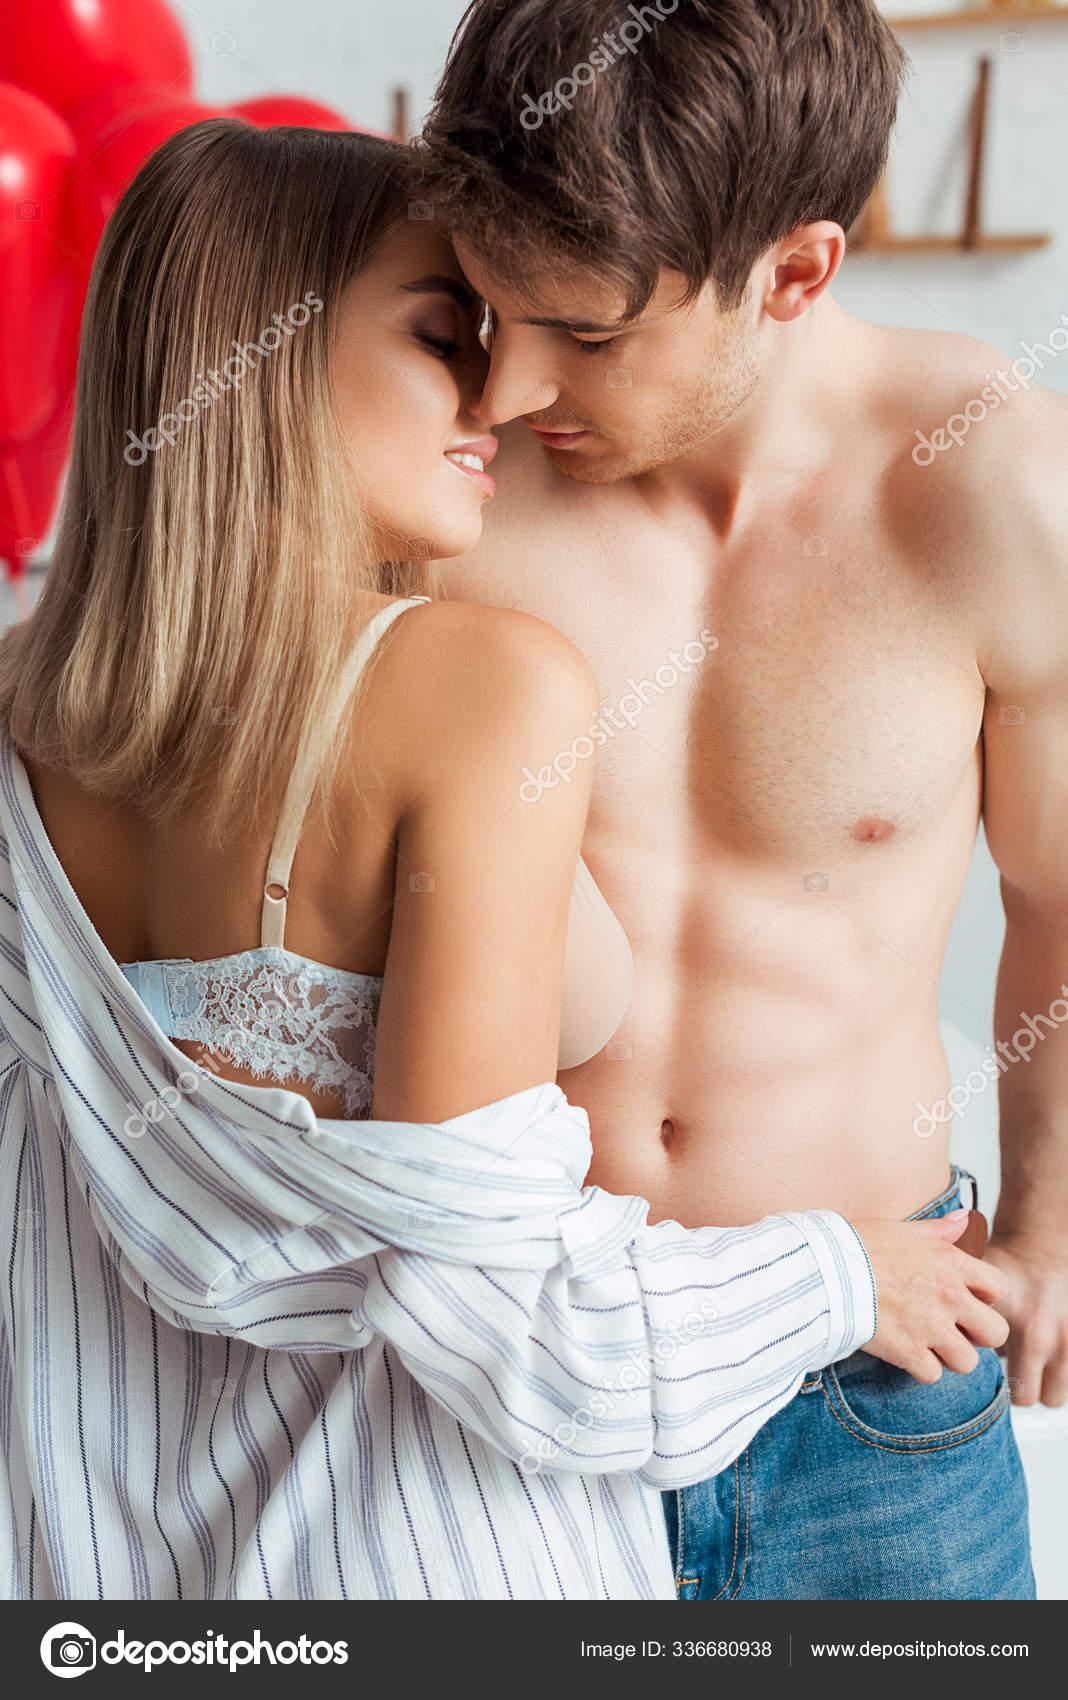 Breast touching pics Happy Woman Big Breast Touching Muscular Boyfriend Stock Photo By C Haydmitriy 336680938